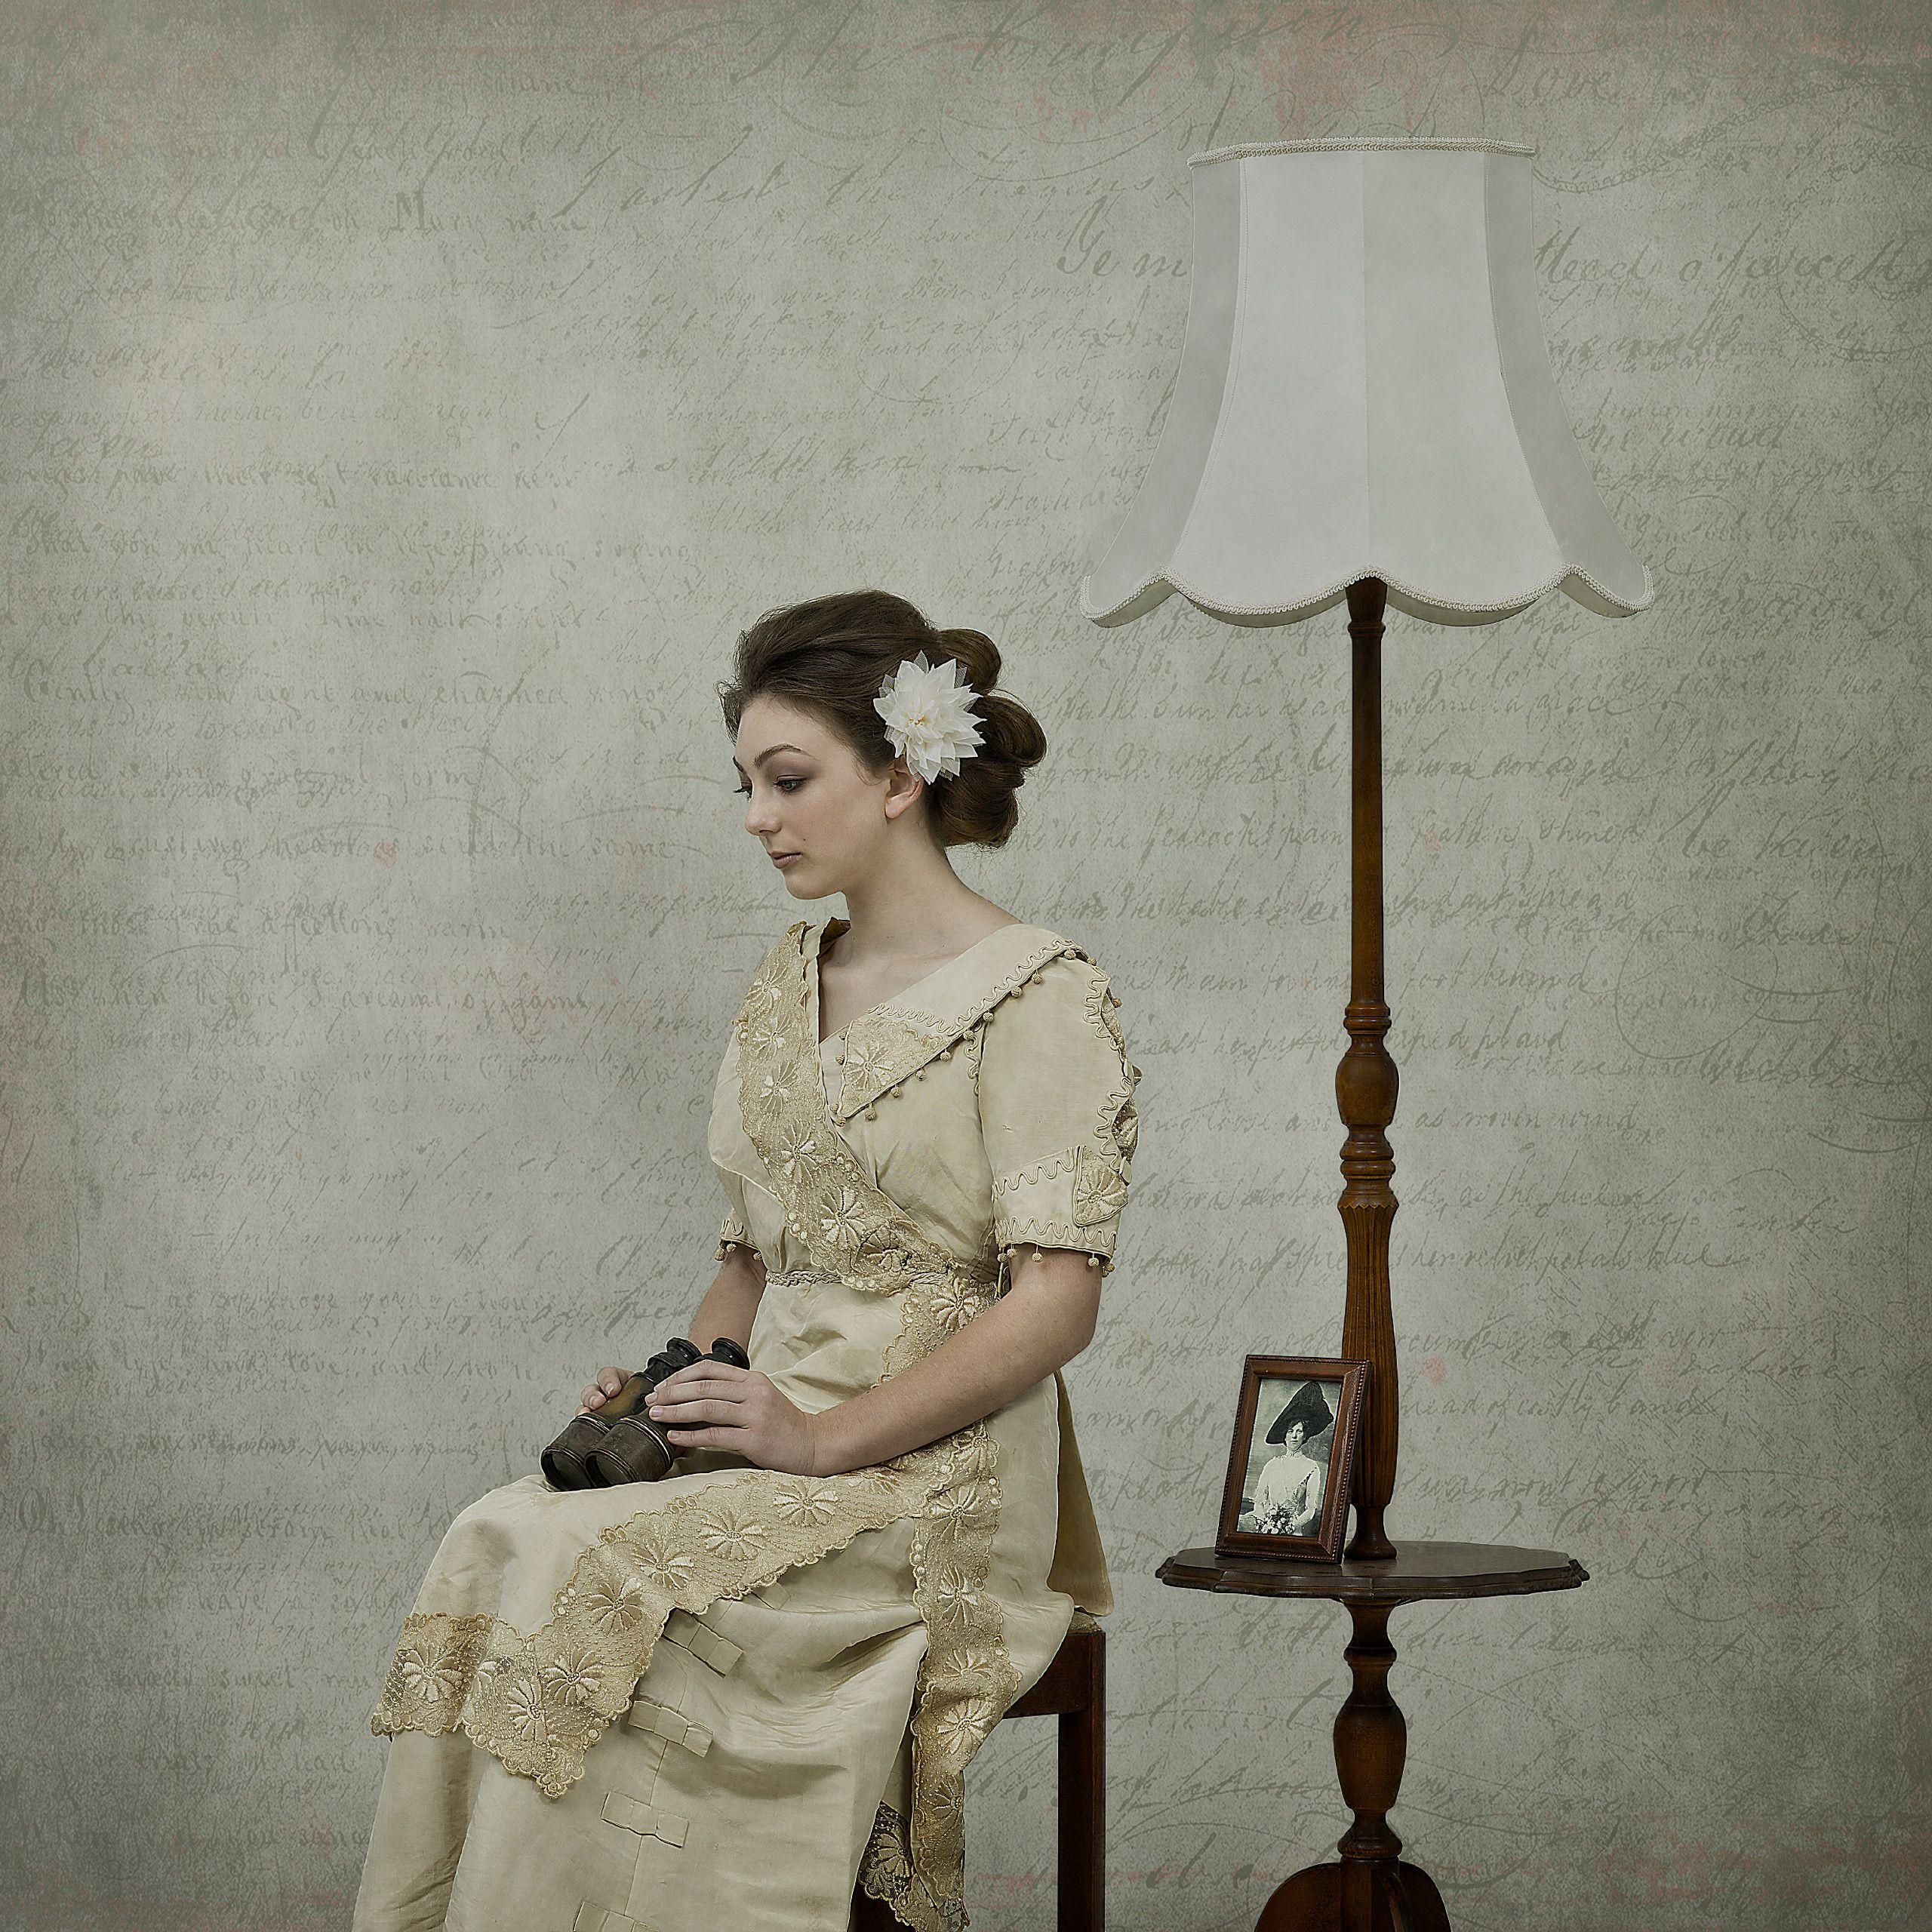 Portraits_020.jpg